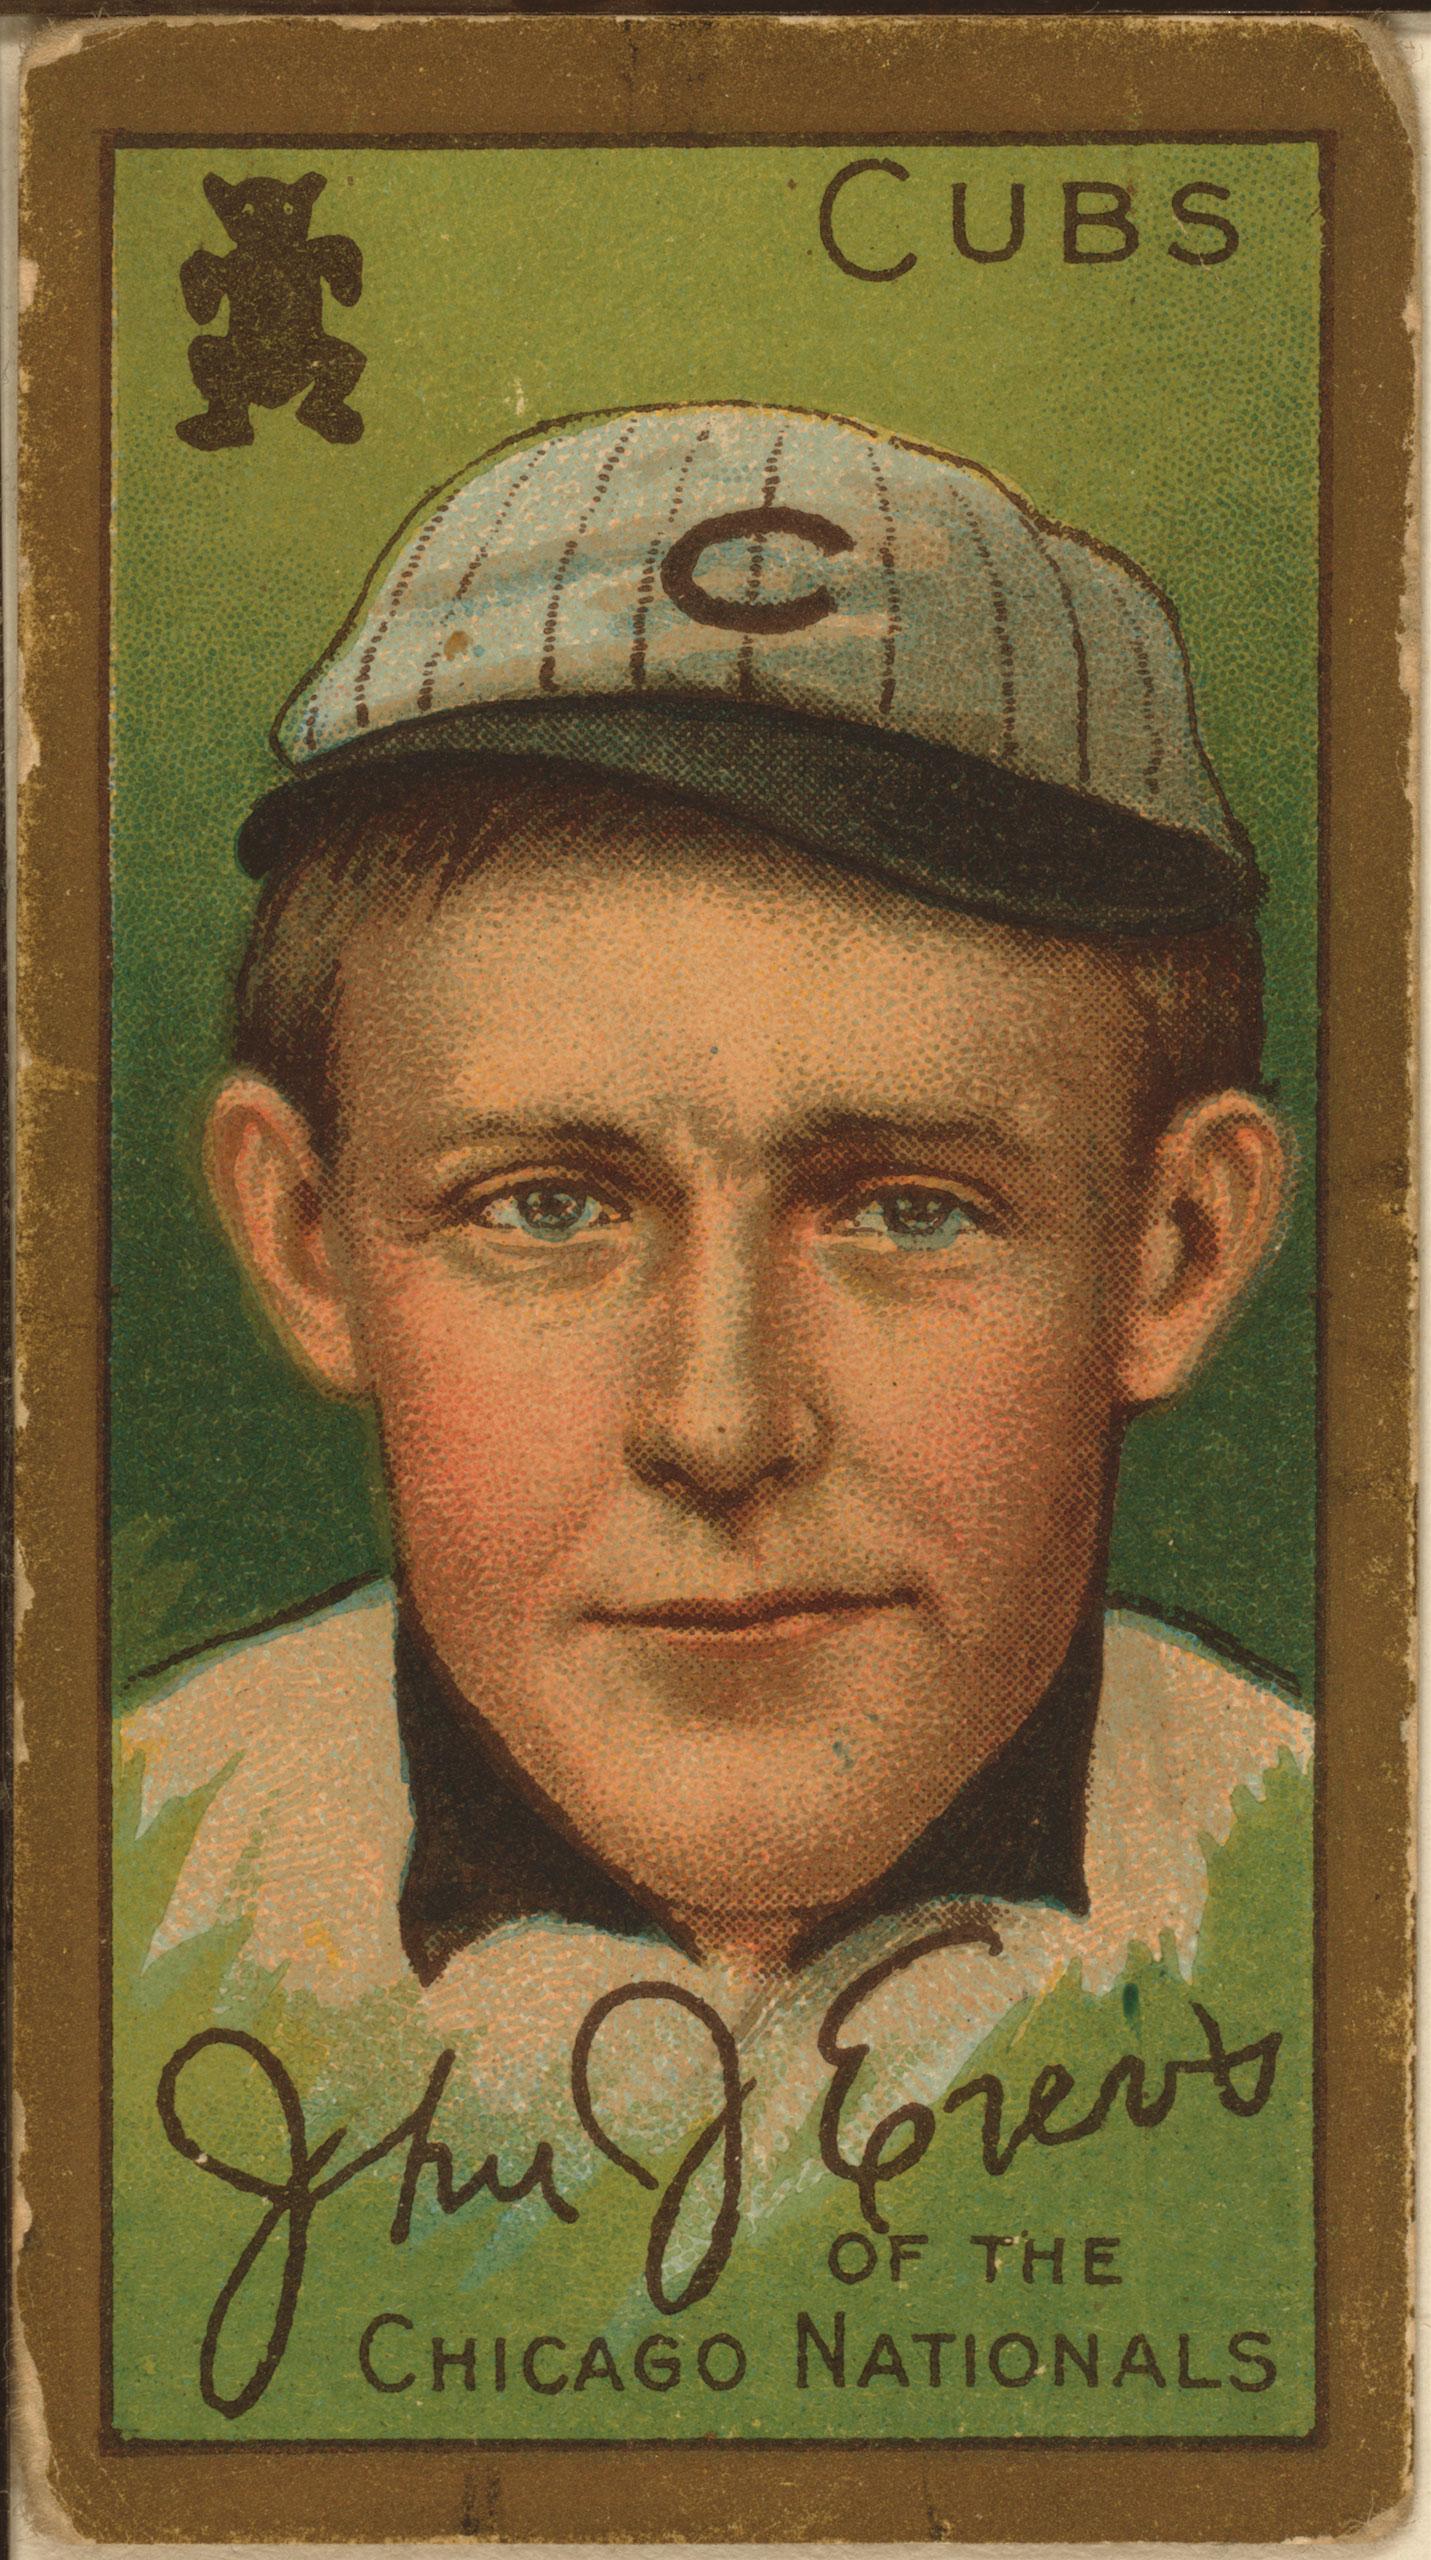 John J. Evers, Chicago Cubs, baseball card, 1911.